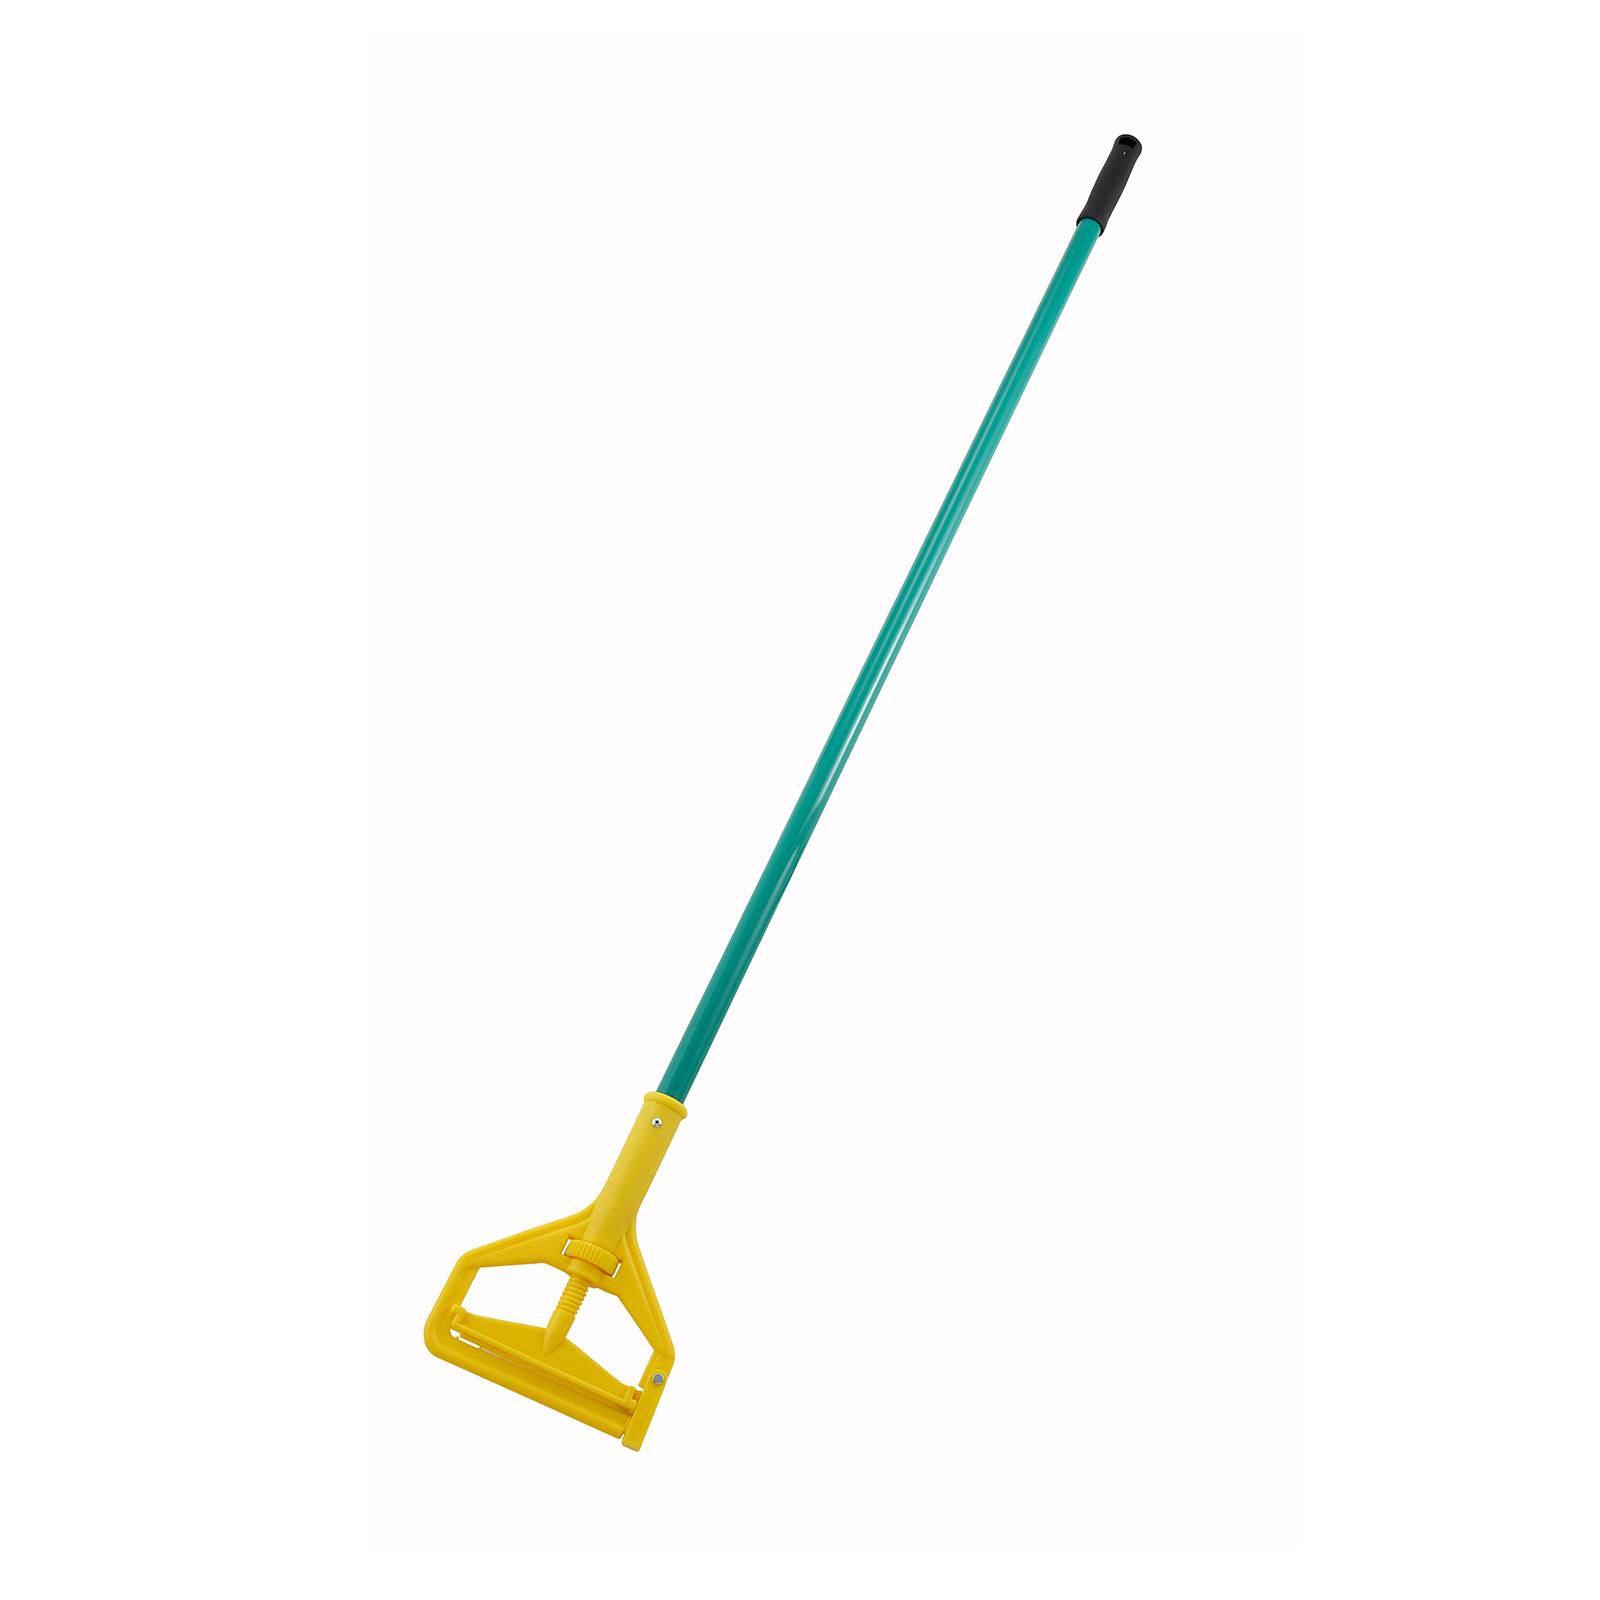 3700-1201 Winco MOPH-7P mop broom handle